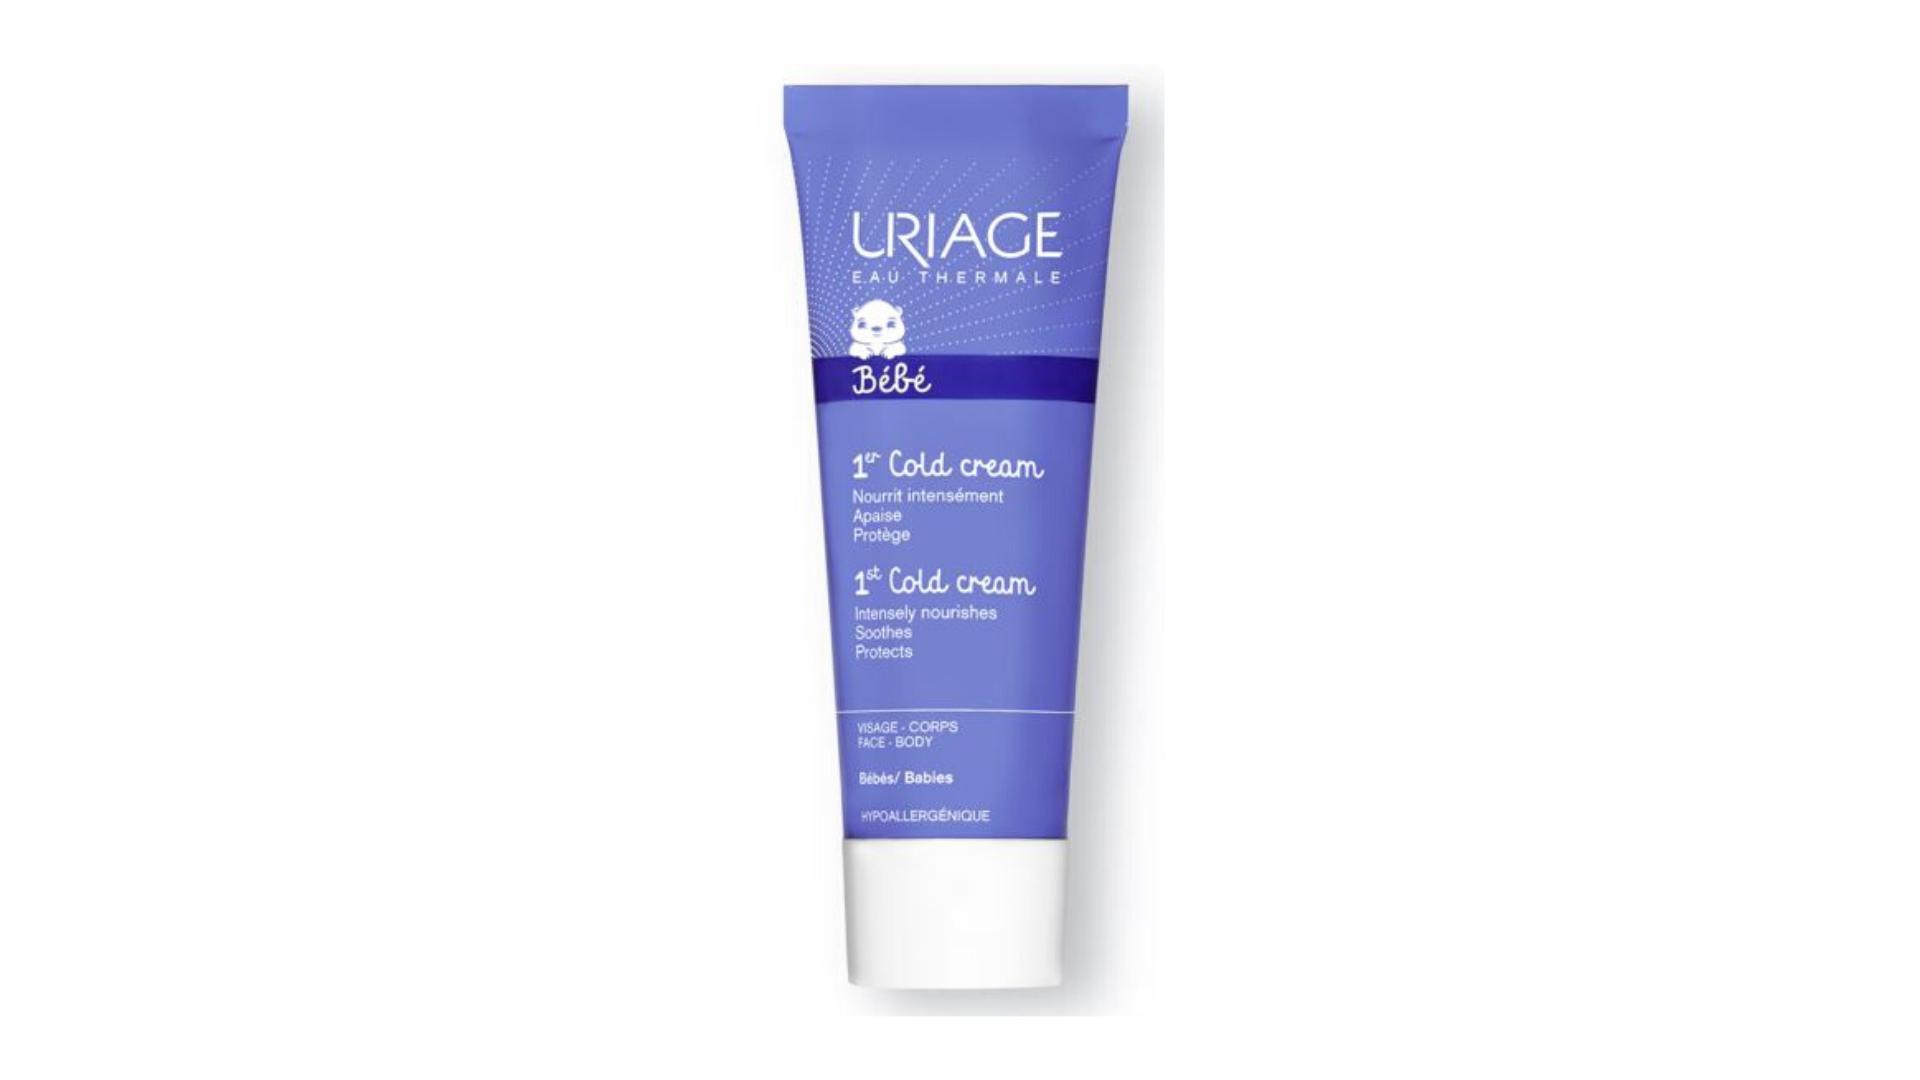 Uriage | Bébé 1º Cold Cream